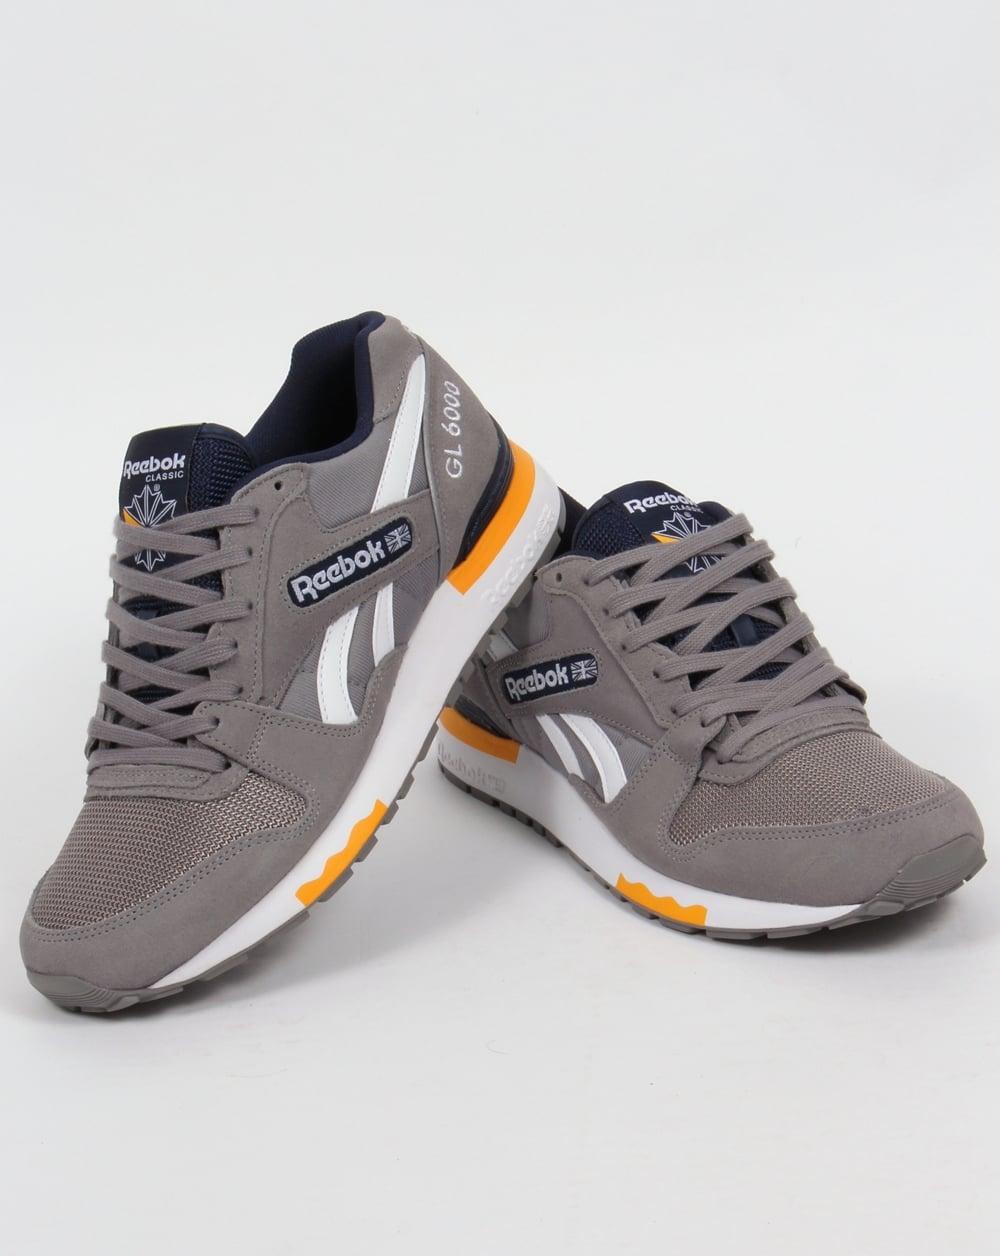 f4d1f0e5dd5ed Reebok GL 6000 Athletic Trainers Mens Trainers Shop Mens Trainers  COLOUR-grey blue